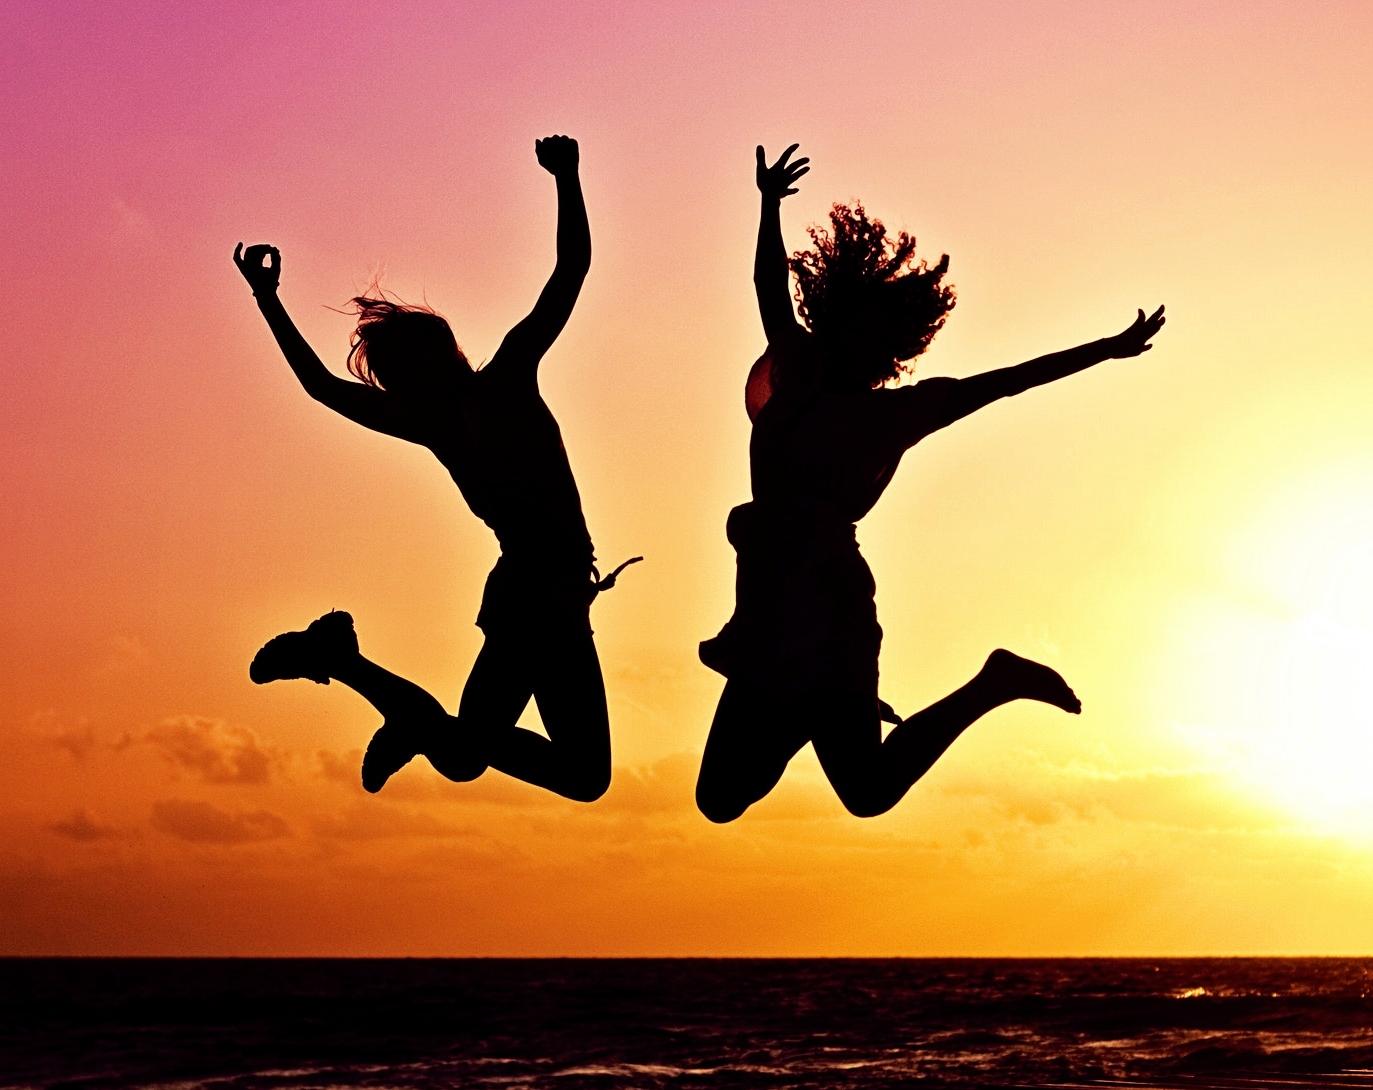 youth-active-jump-happy-sunset pexels.jpeg